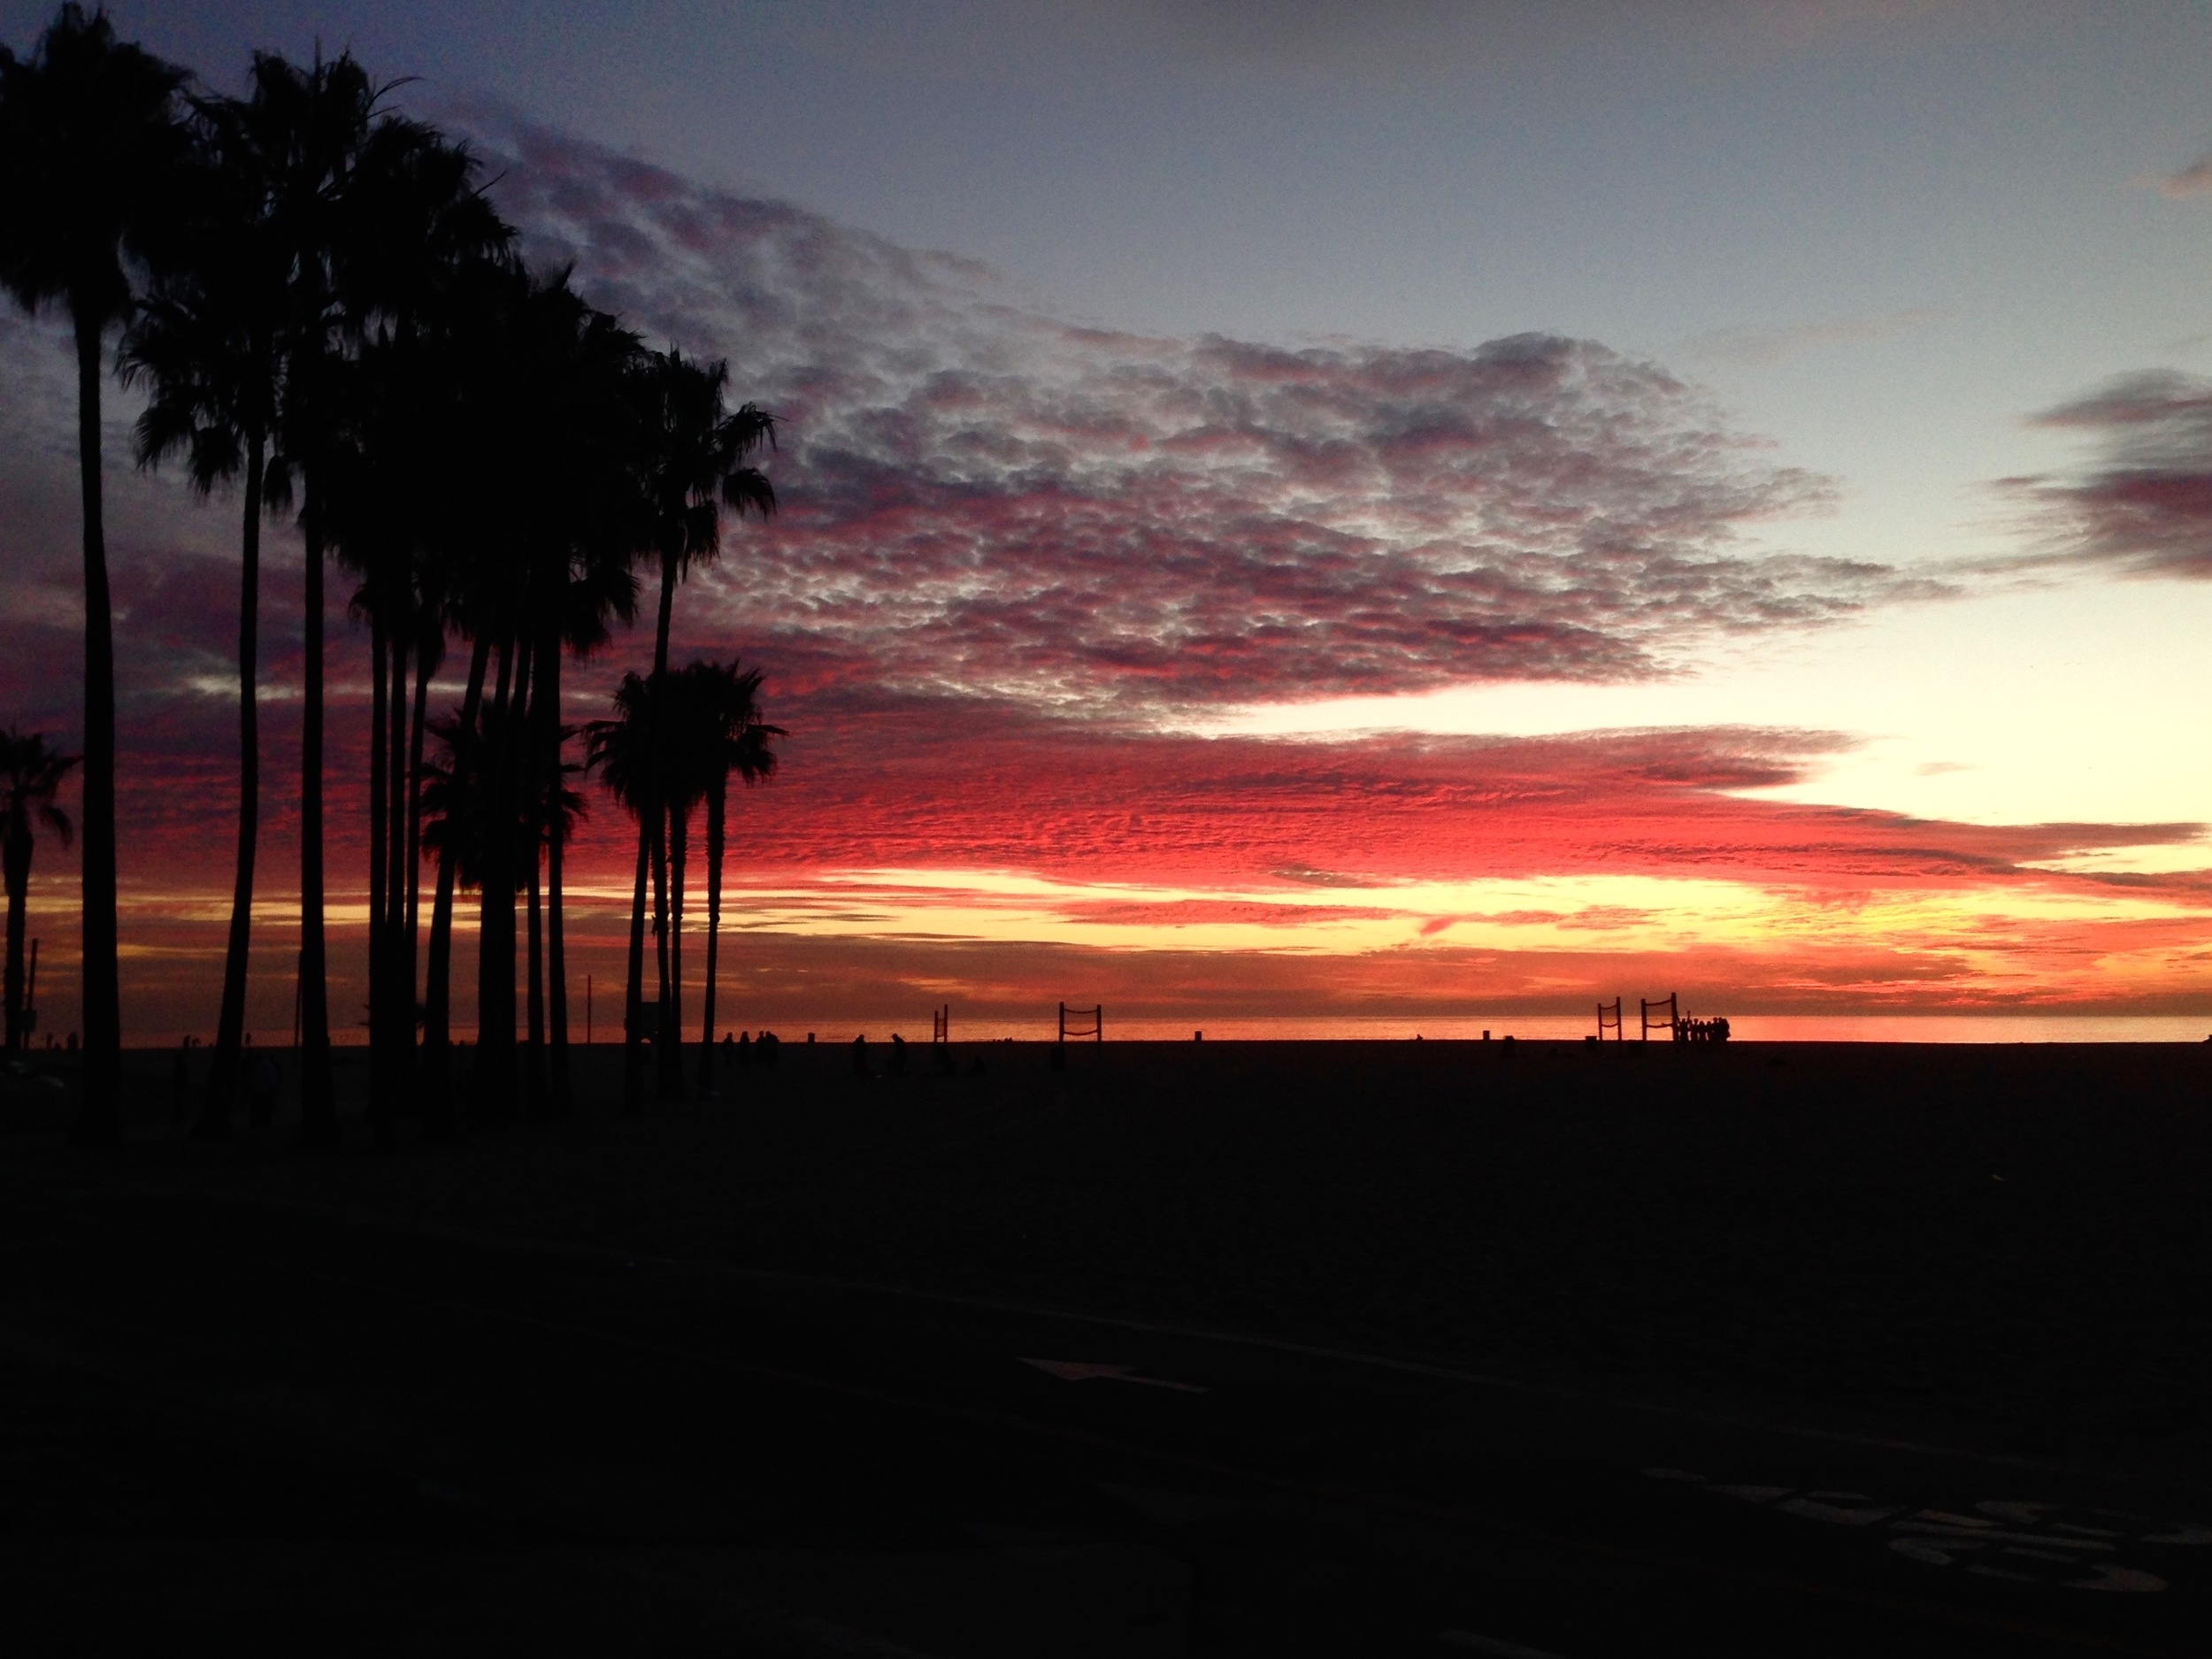 Sunset in Venice Beach, California - 3 Days*